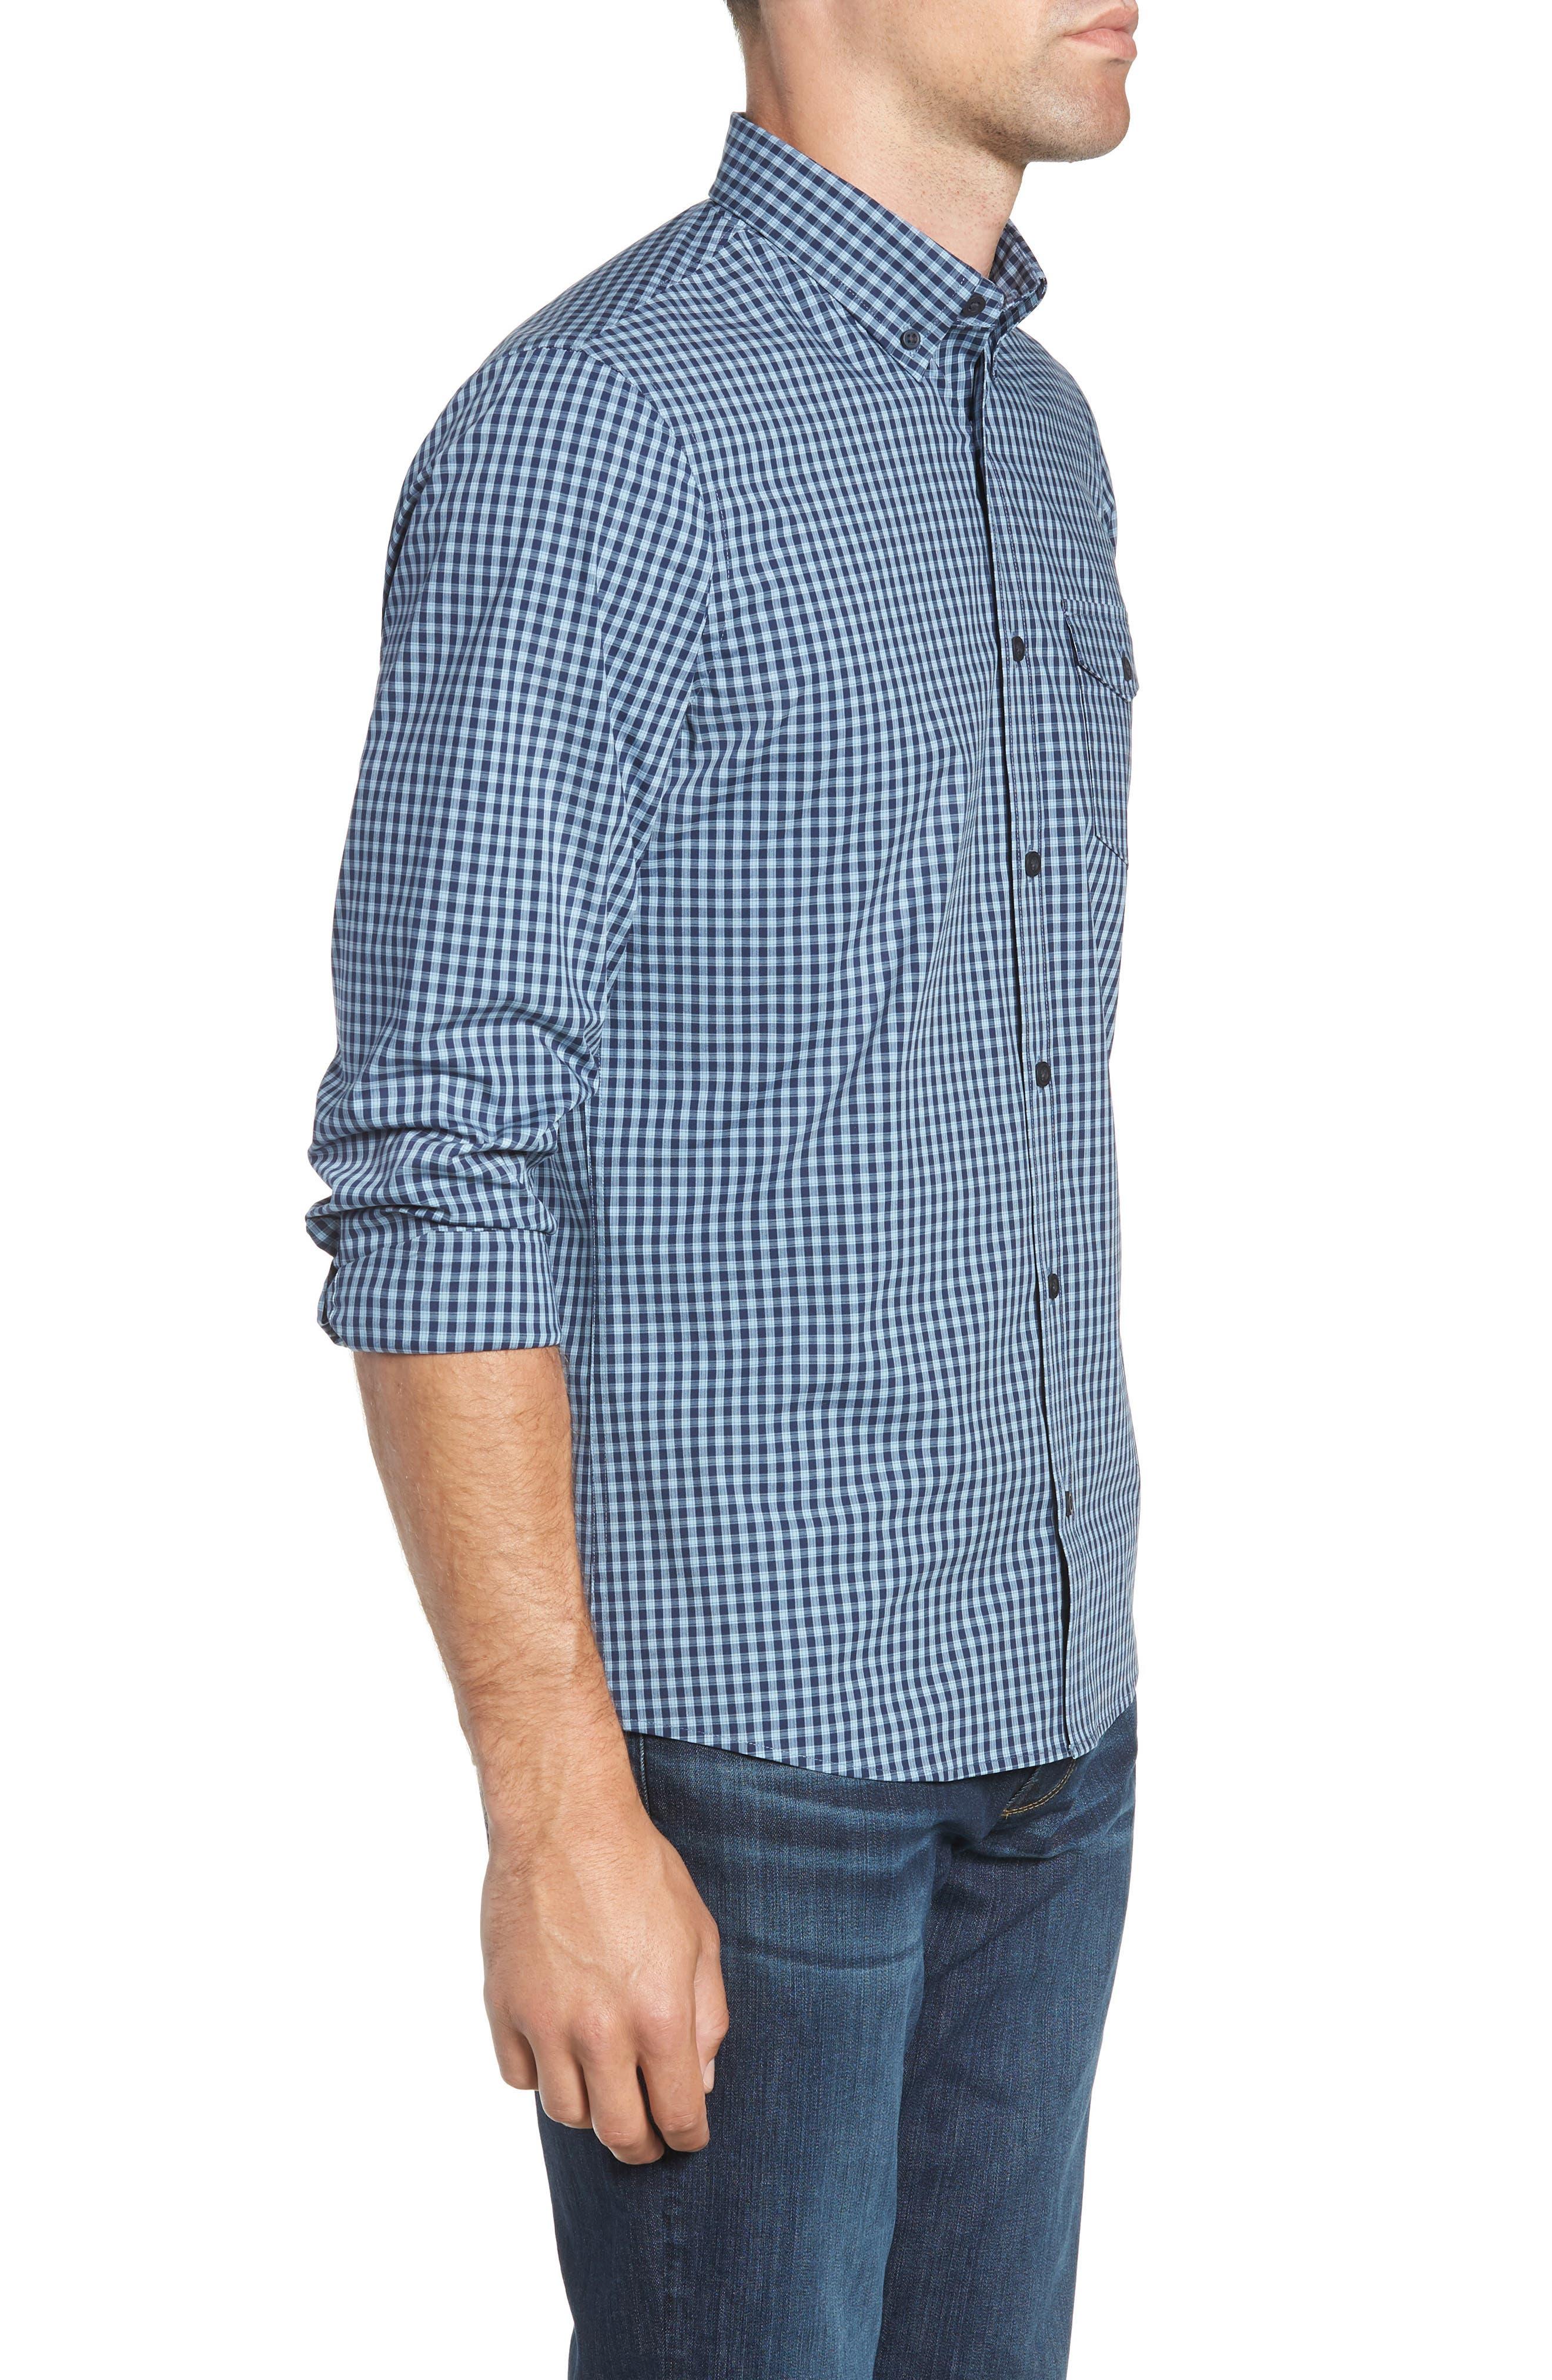 Tech-Smart Slim Fit Check Sport Shirt,                             Alternate thumbnail 4, color,                             NAVY NIGHT BLUE CHECK